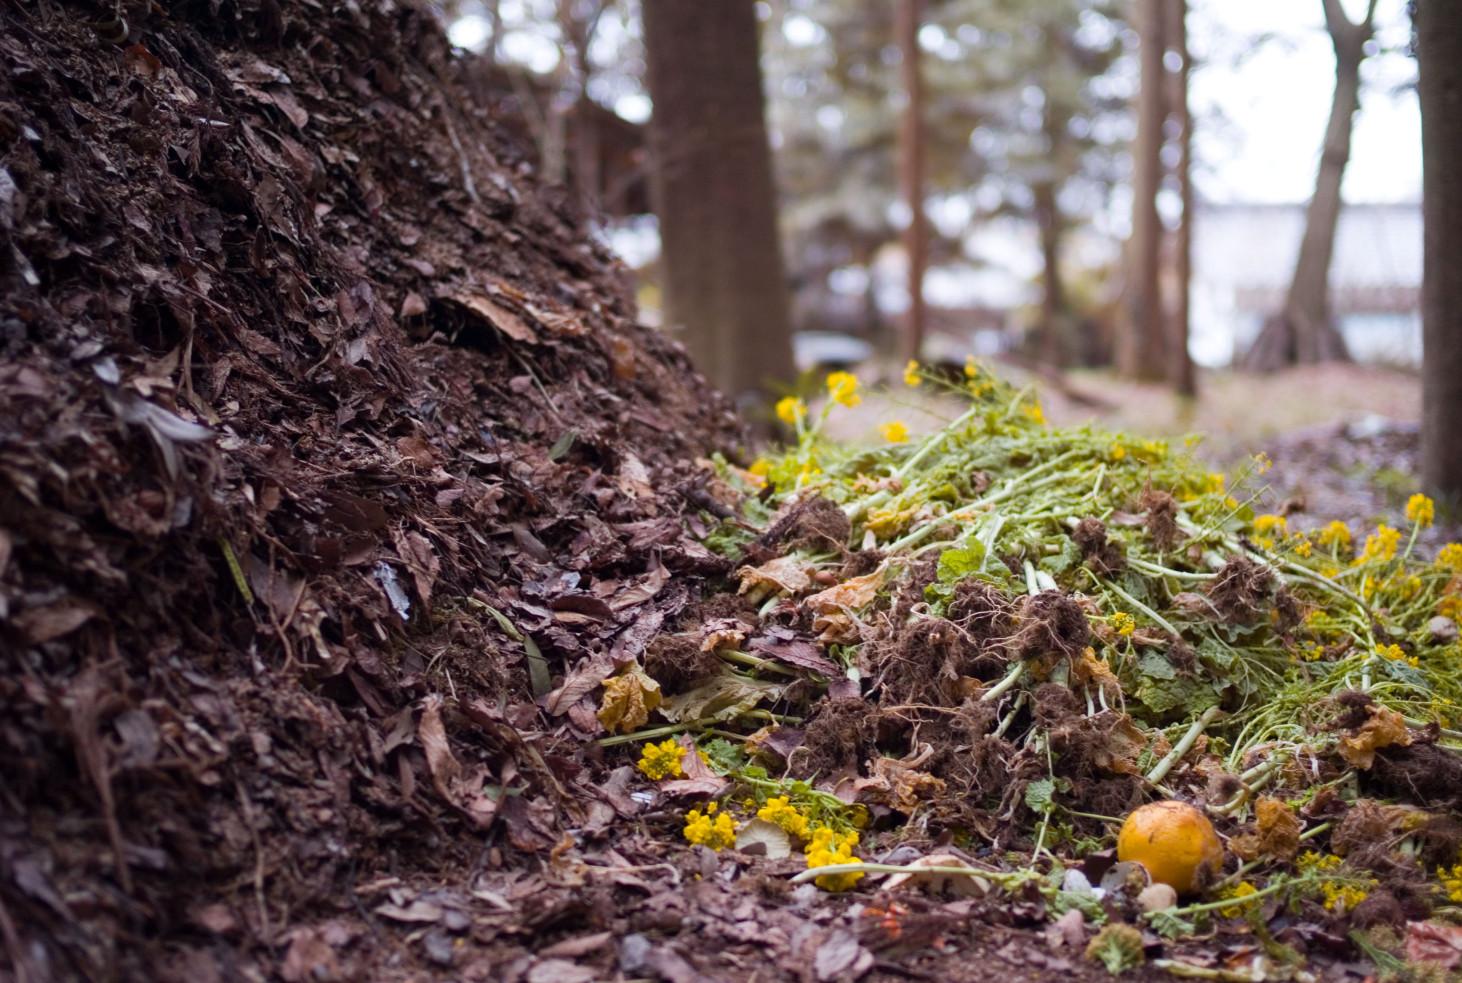 garden brown green compost nature soil